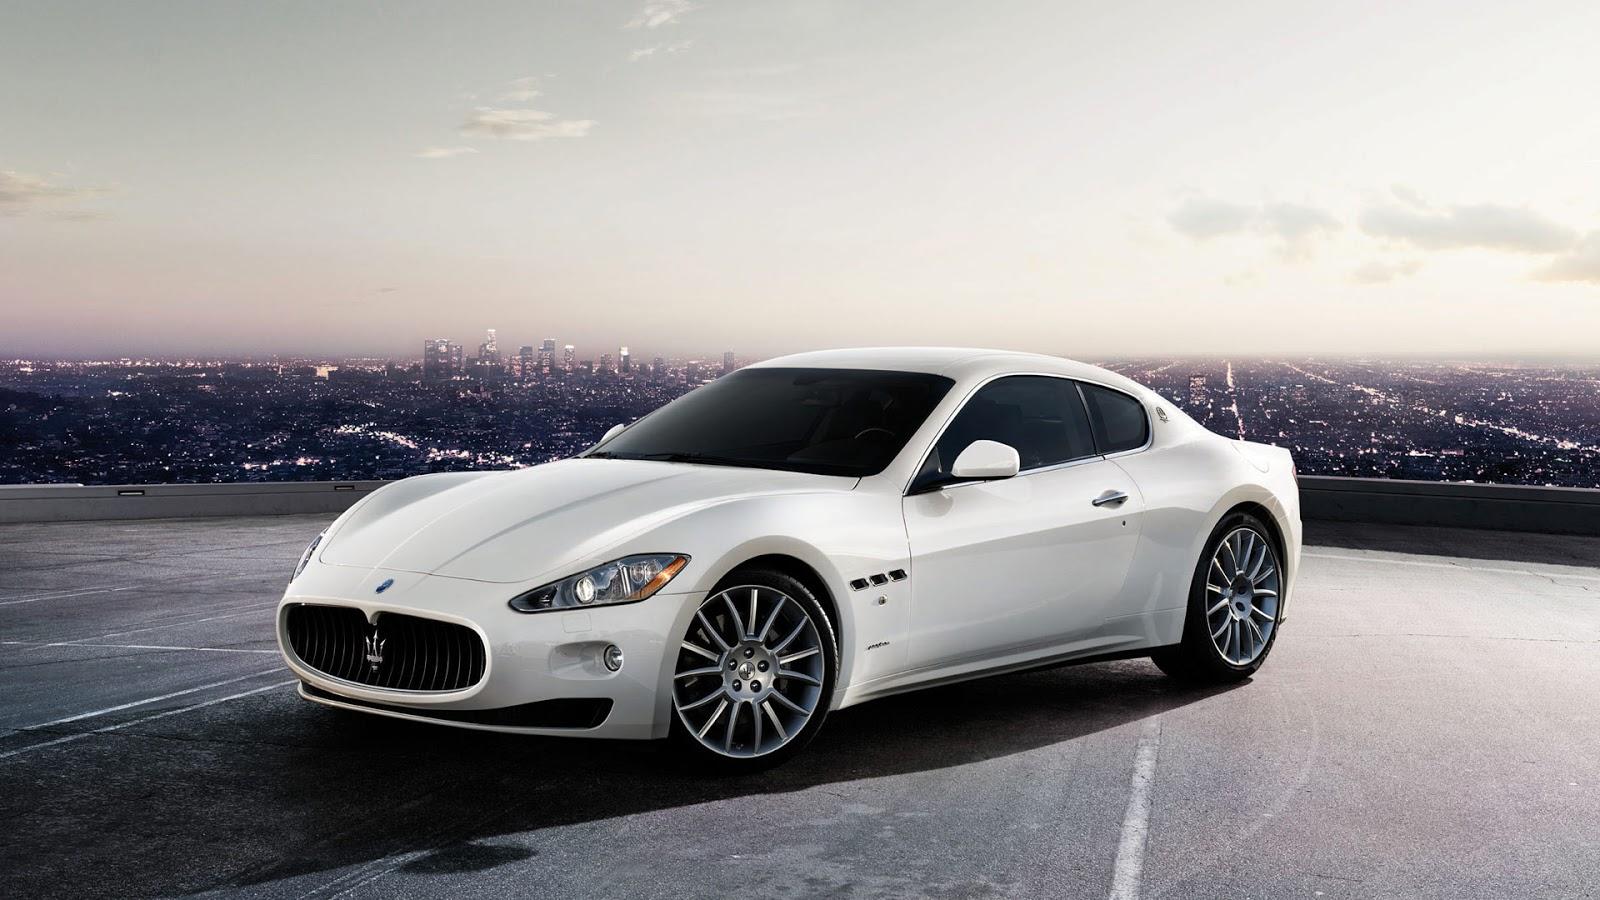 http://3.bp.blogspot.com/-ZNlI9voK9-8/UMYCadtB6lI/AAAAAAAAKLQ/WSqdNVGJ4g0/s1600/Maserati_GranTurismo_S_Automatic1080.jpg